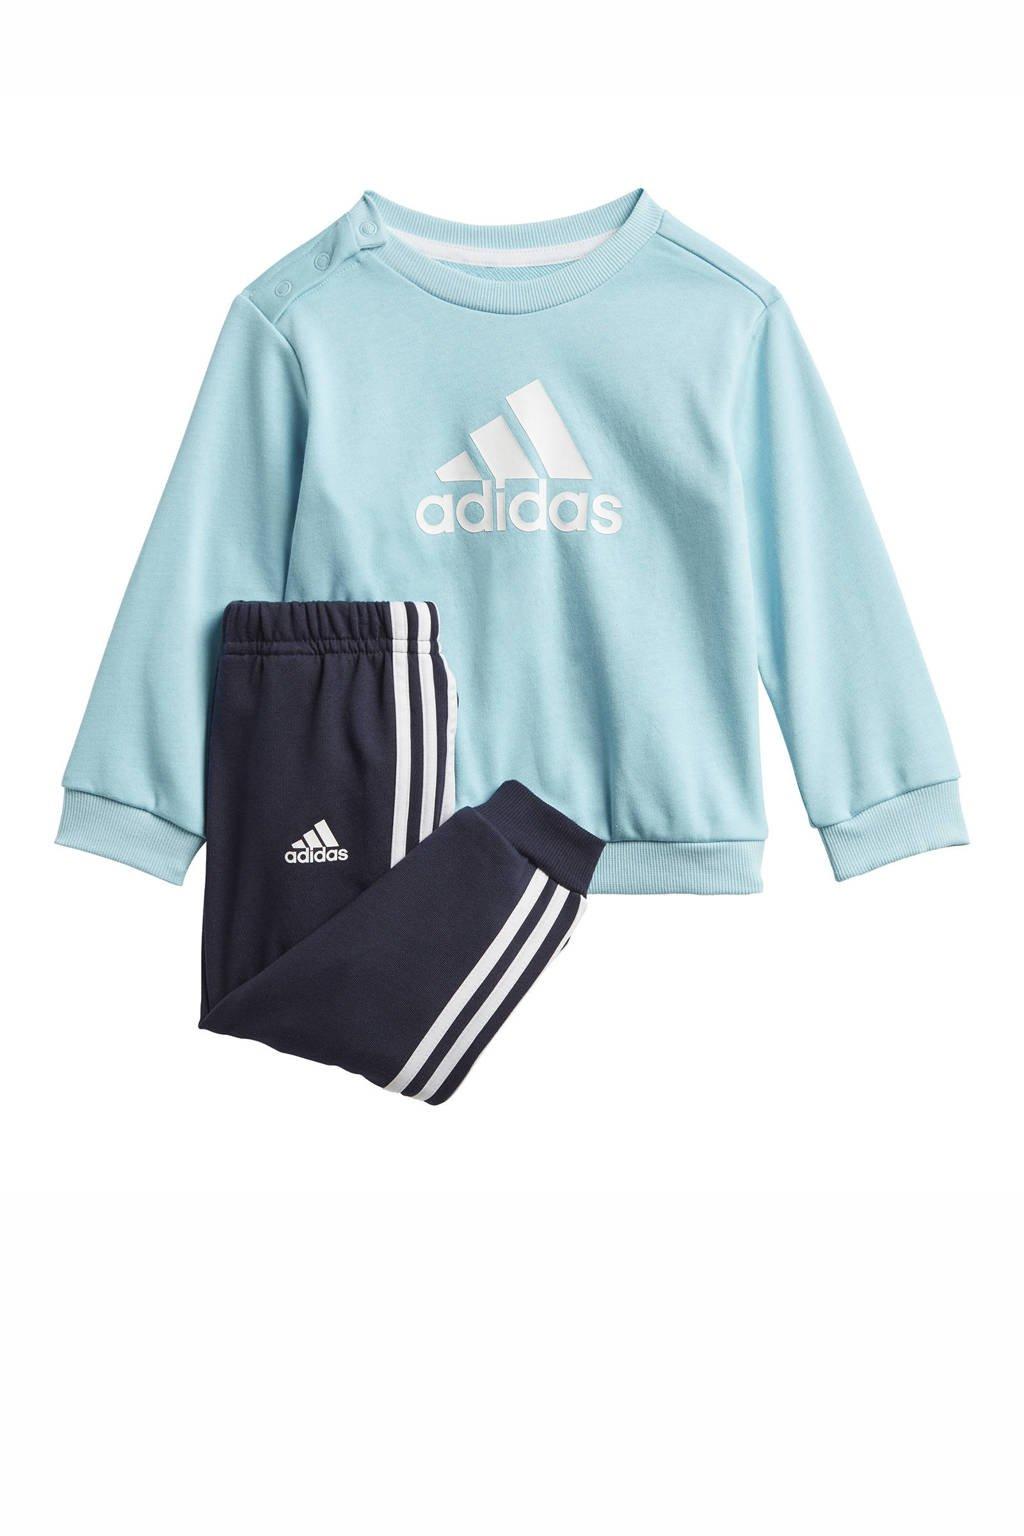 adidas Performance   joggingpak lichtblauw/wit, Lichtblauw/wit